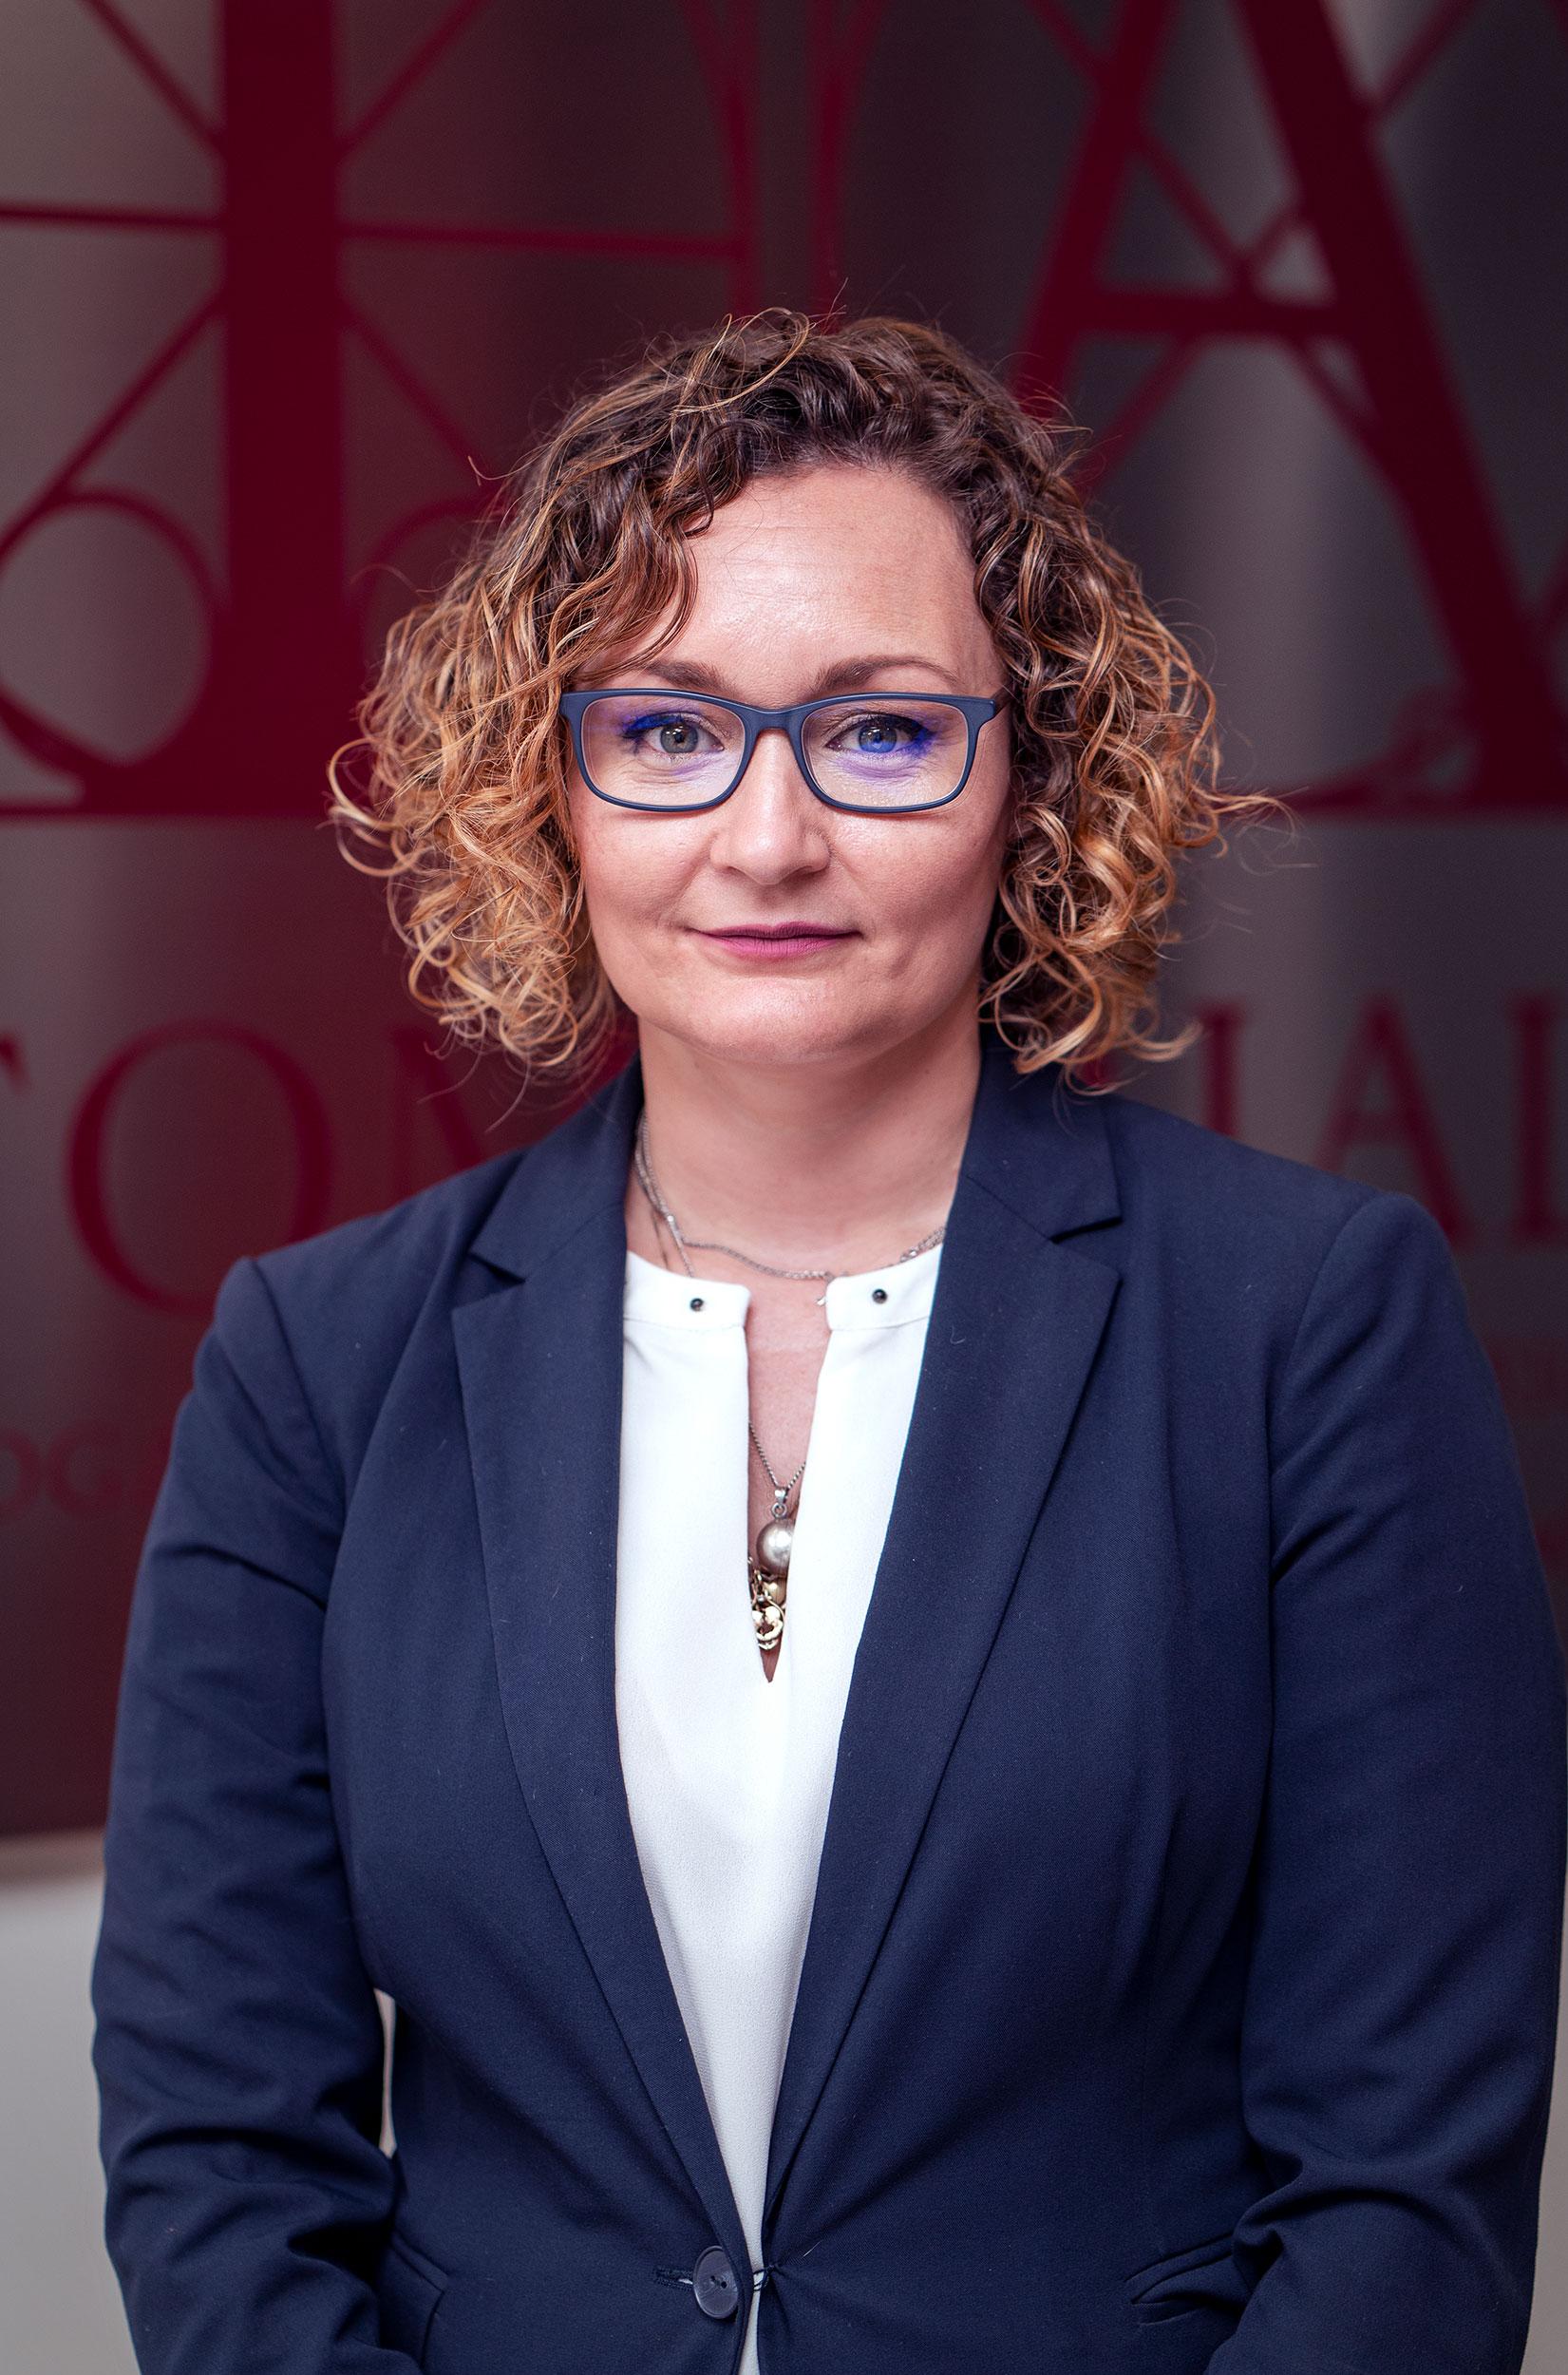 Esther Micó García